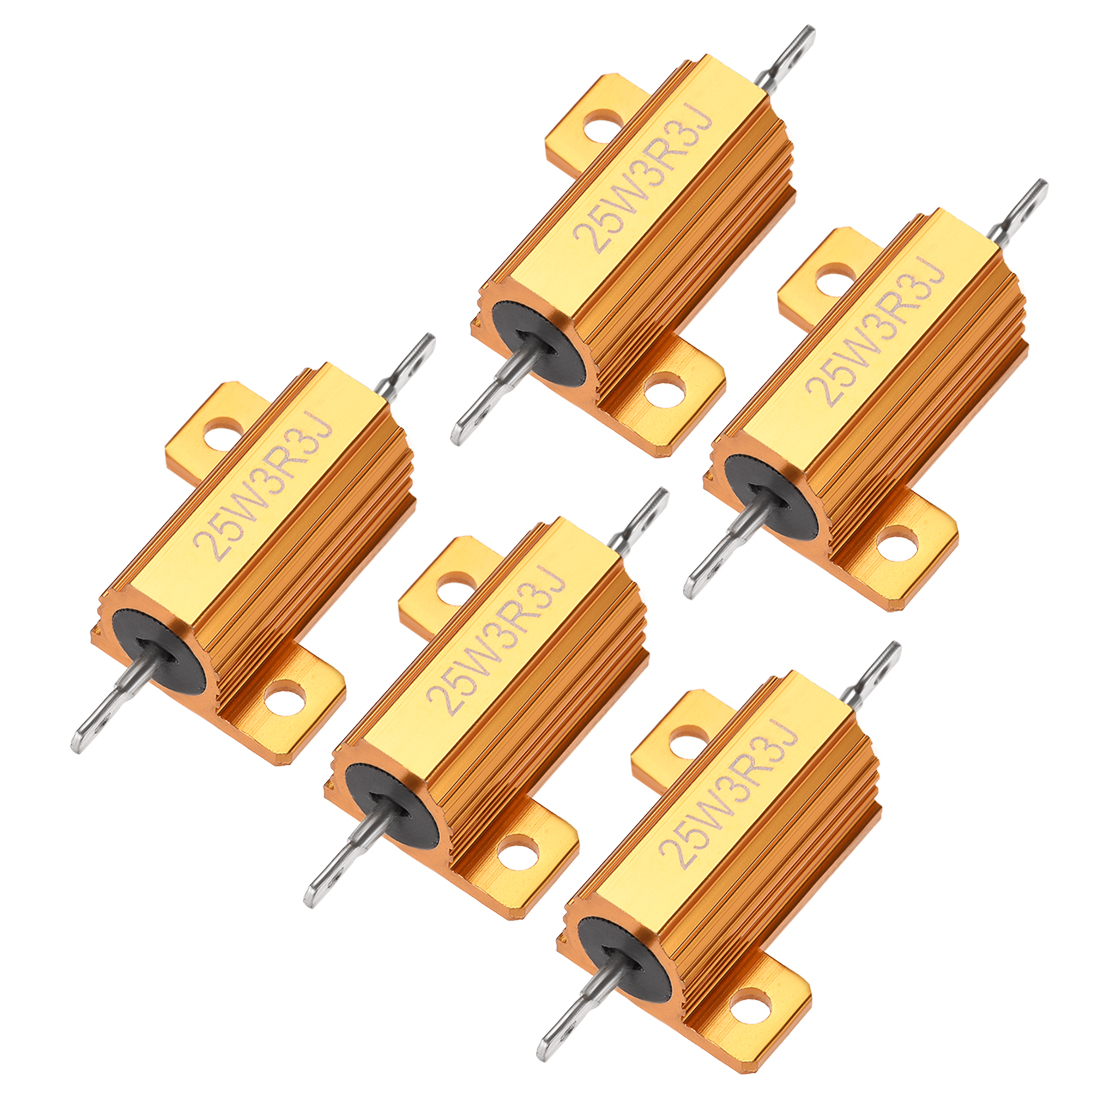 25W 3.3 Ohm 5% Aluminum Housing Resistor Wirewound Resistor Gold Tone 5 Pcs